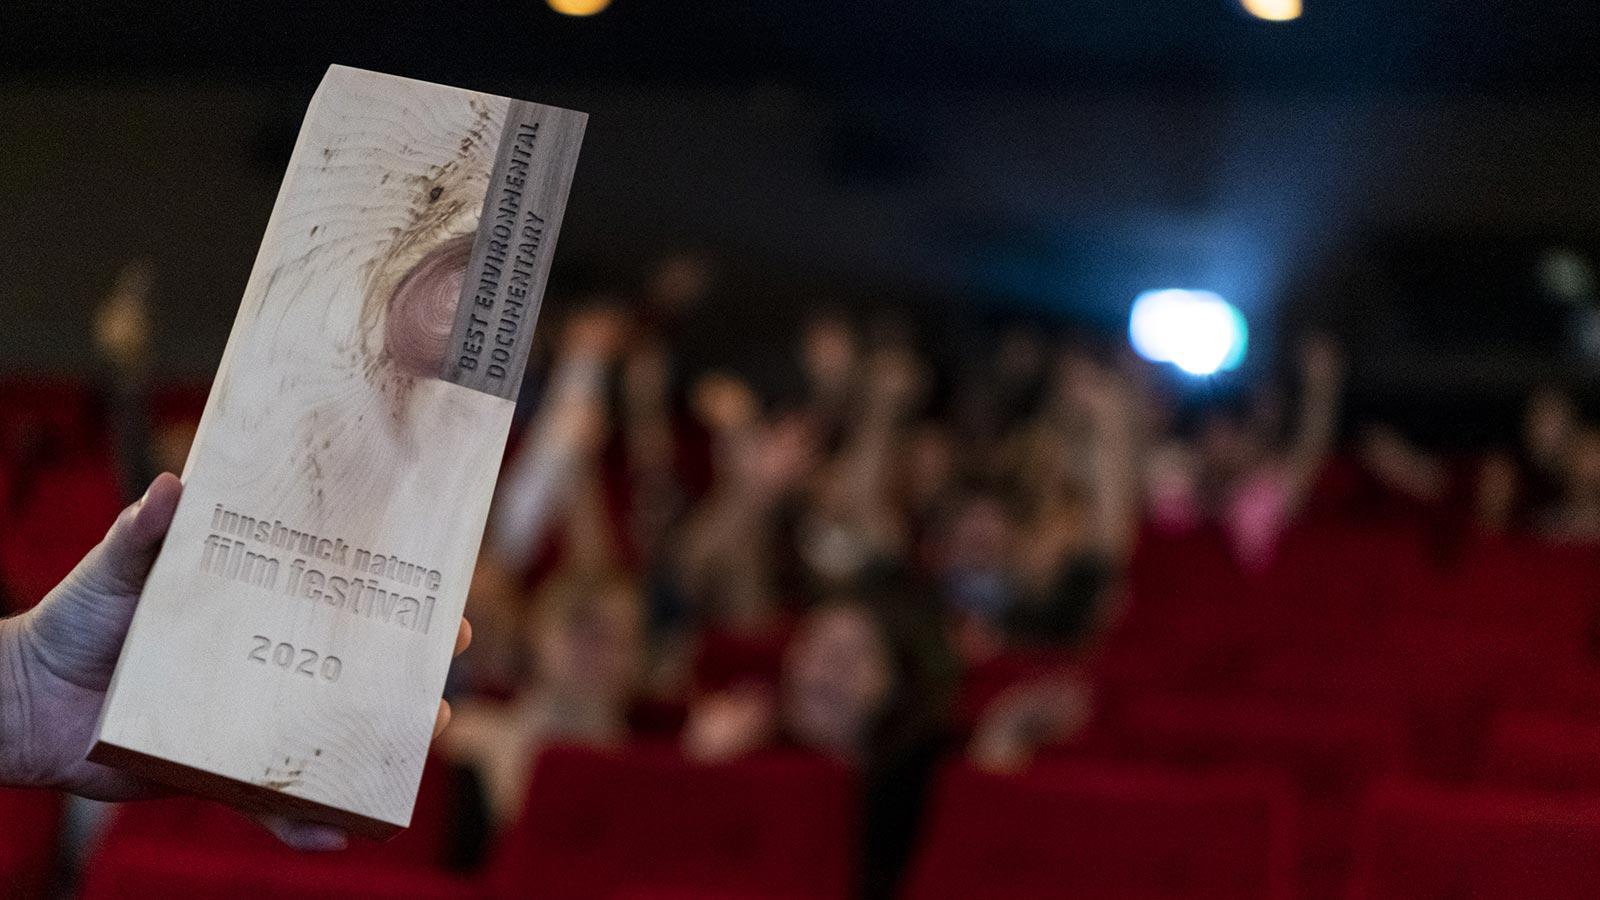 Best Environmental film Trophy